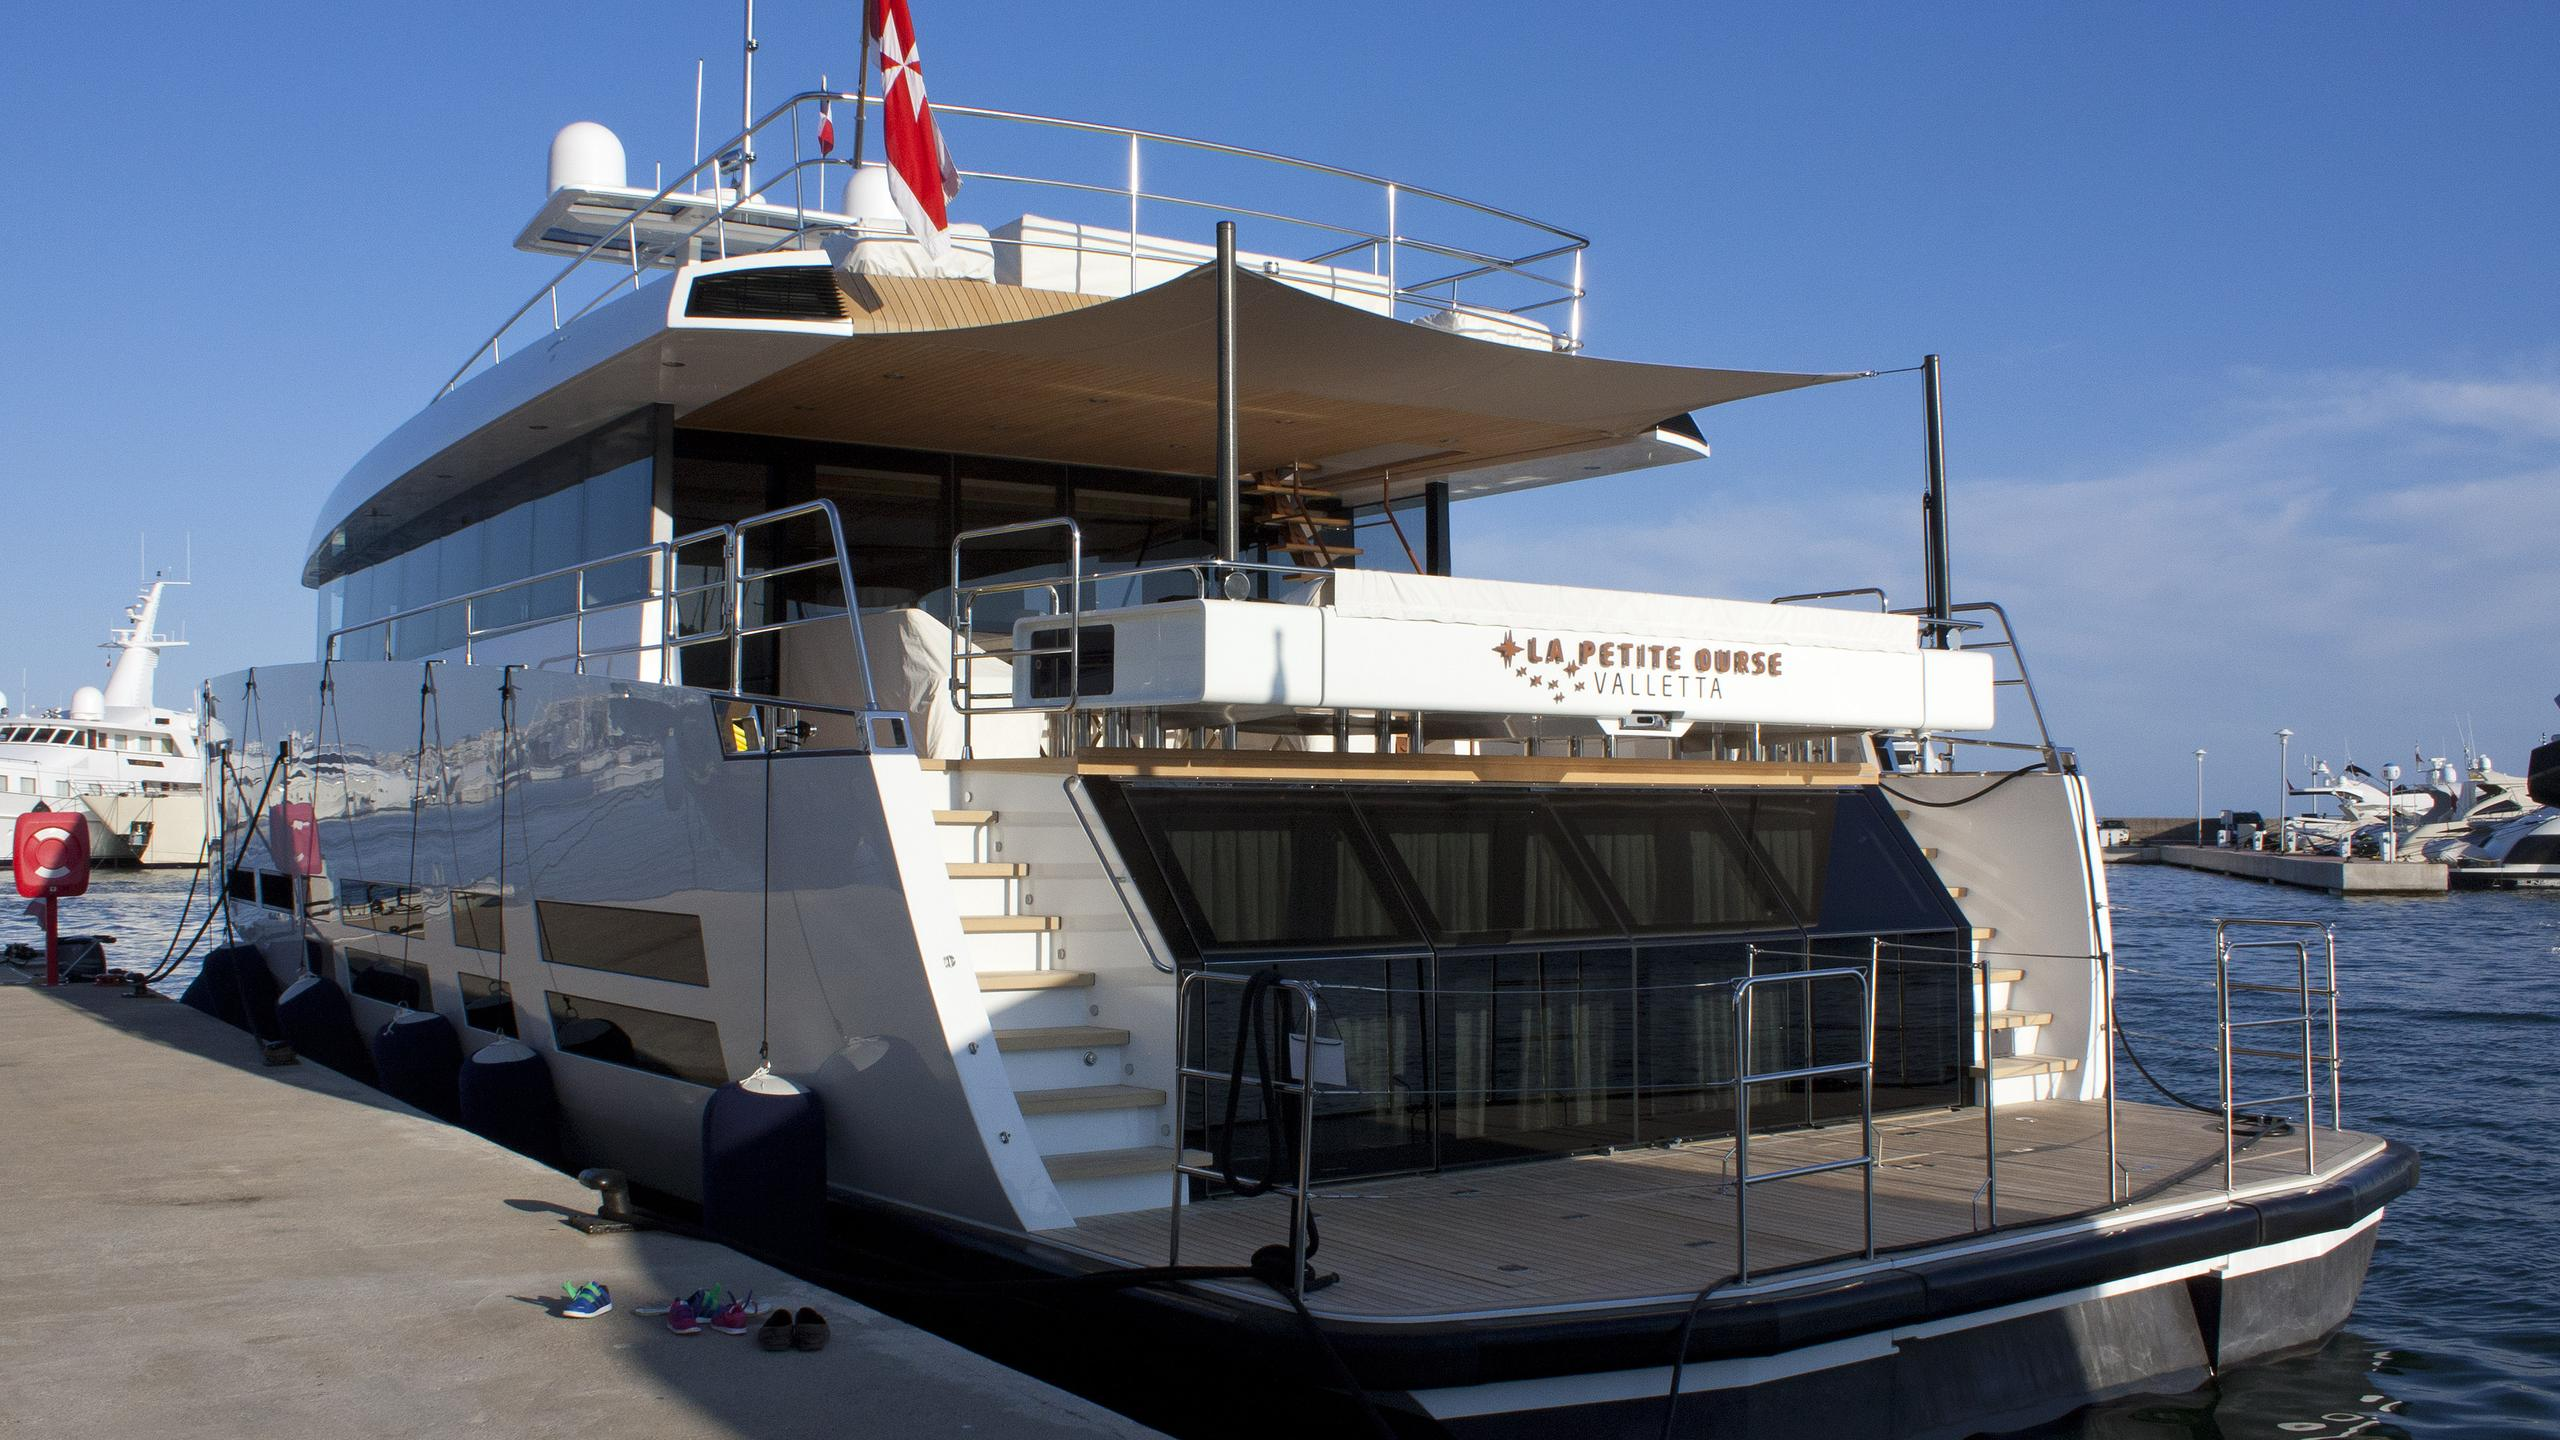 la-petite-ourse-motor-yacht-wallyace-2014-26m-stern